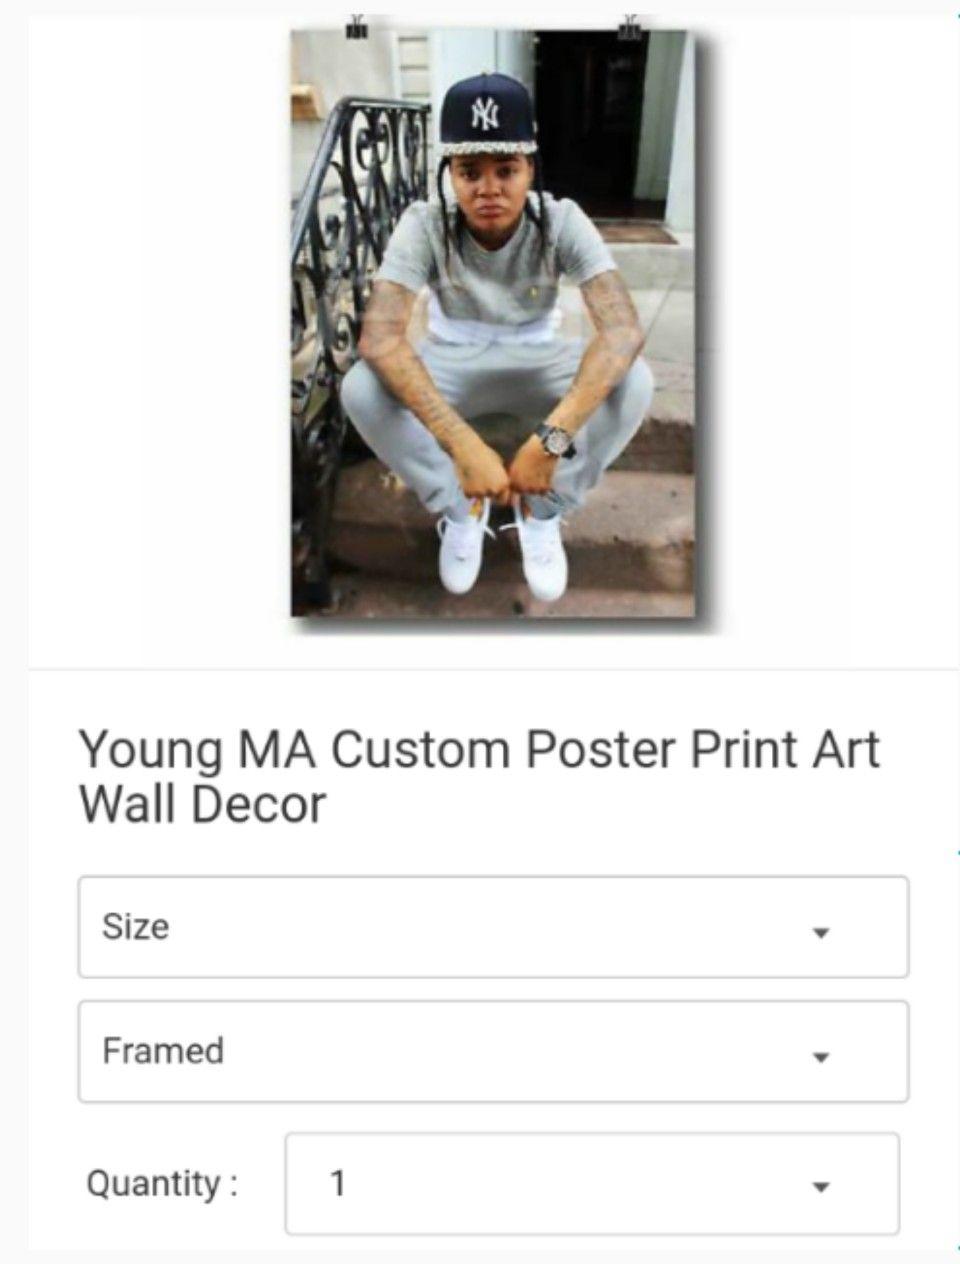 Young MA Custom Poster Print Art Wall Decor